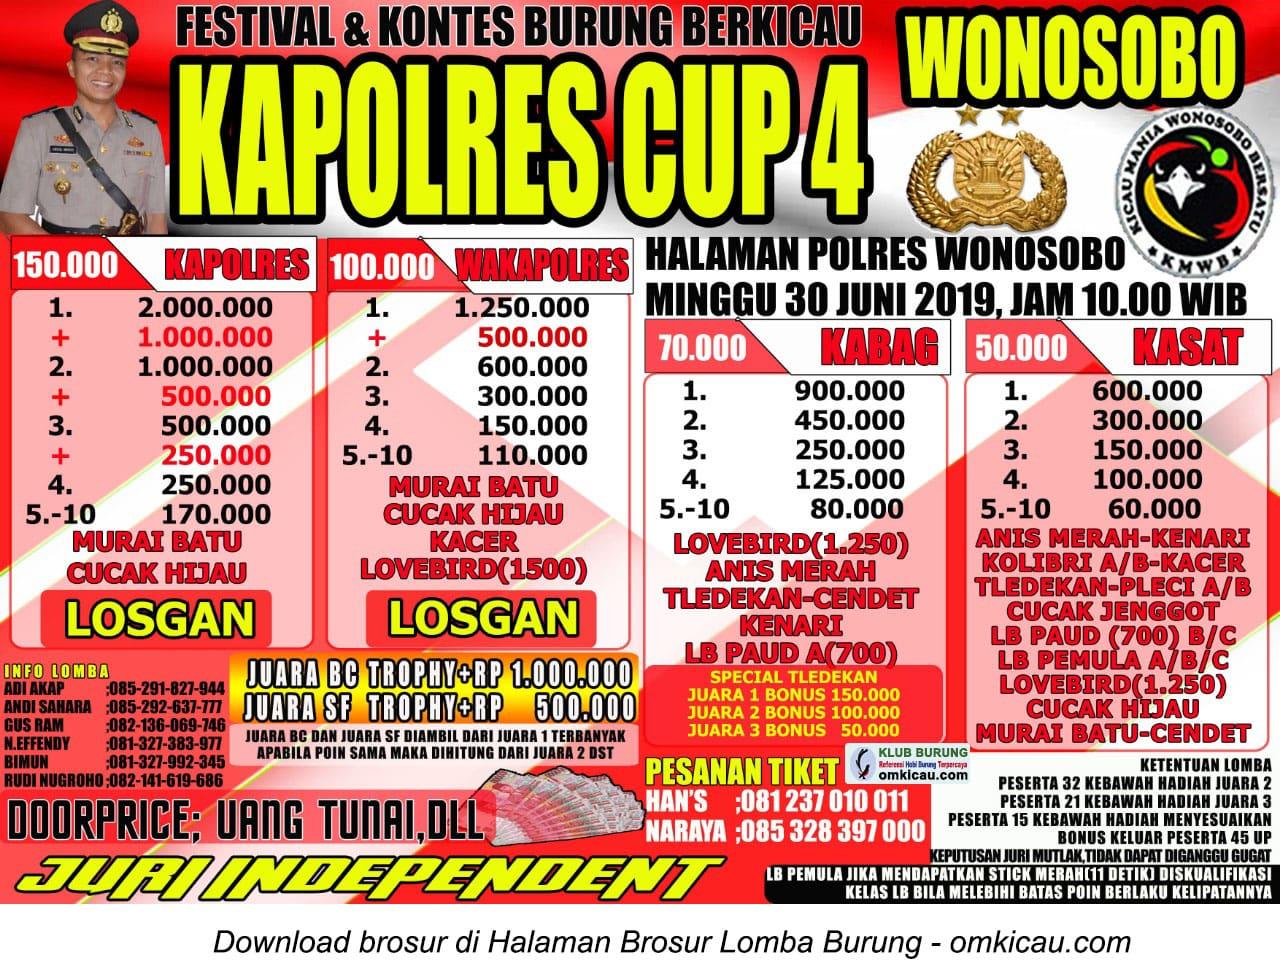 Kapolres Cup 4 Wonosobo